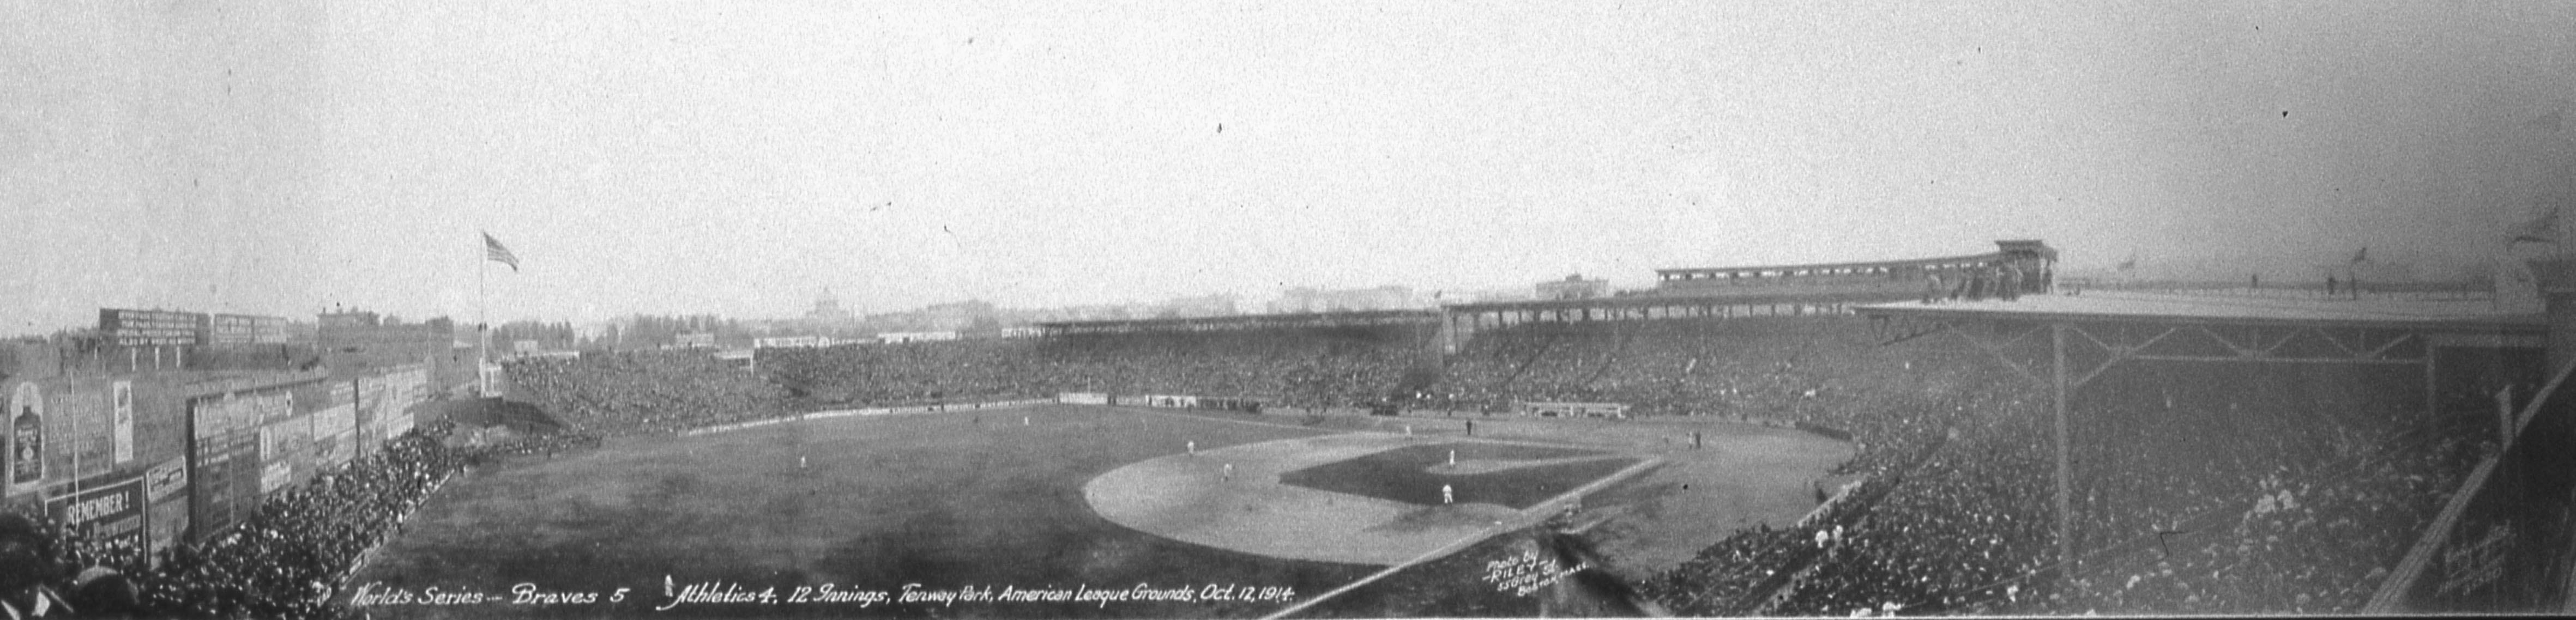 1914 World Series Fenway Park Panoramic